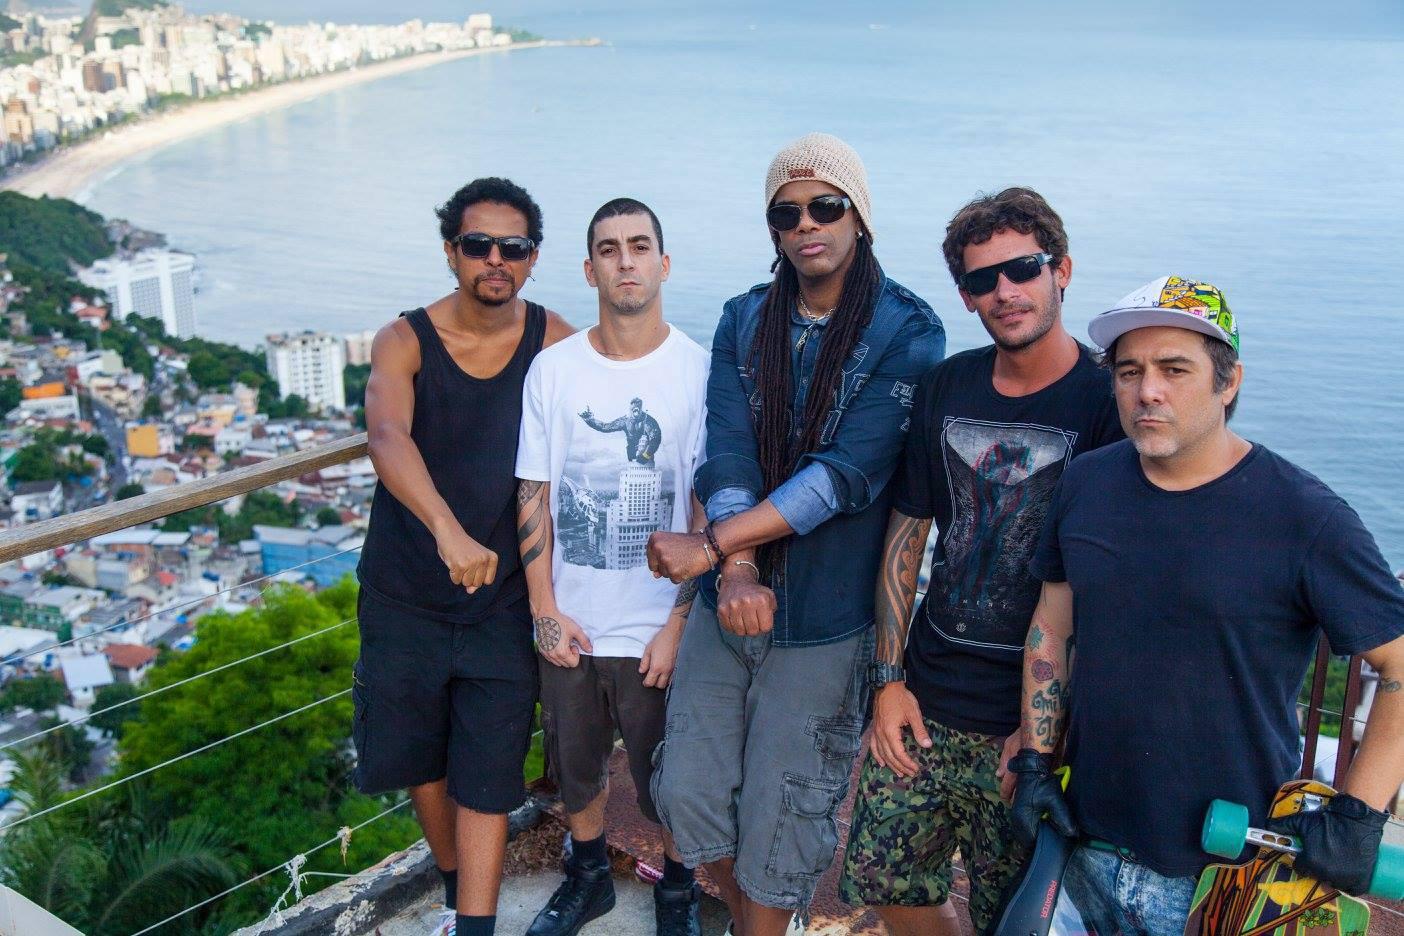 1 (1) Renato ,J Ramos ,Andru, Pedro, Daniel, KARMA FREE relaxing in the FAVELA ,ALTO VIDIGAL..